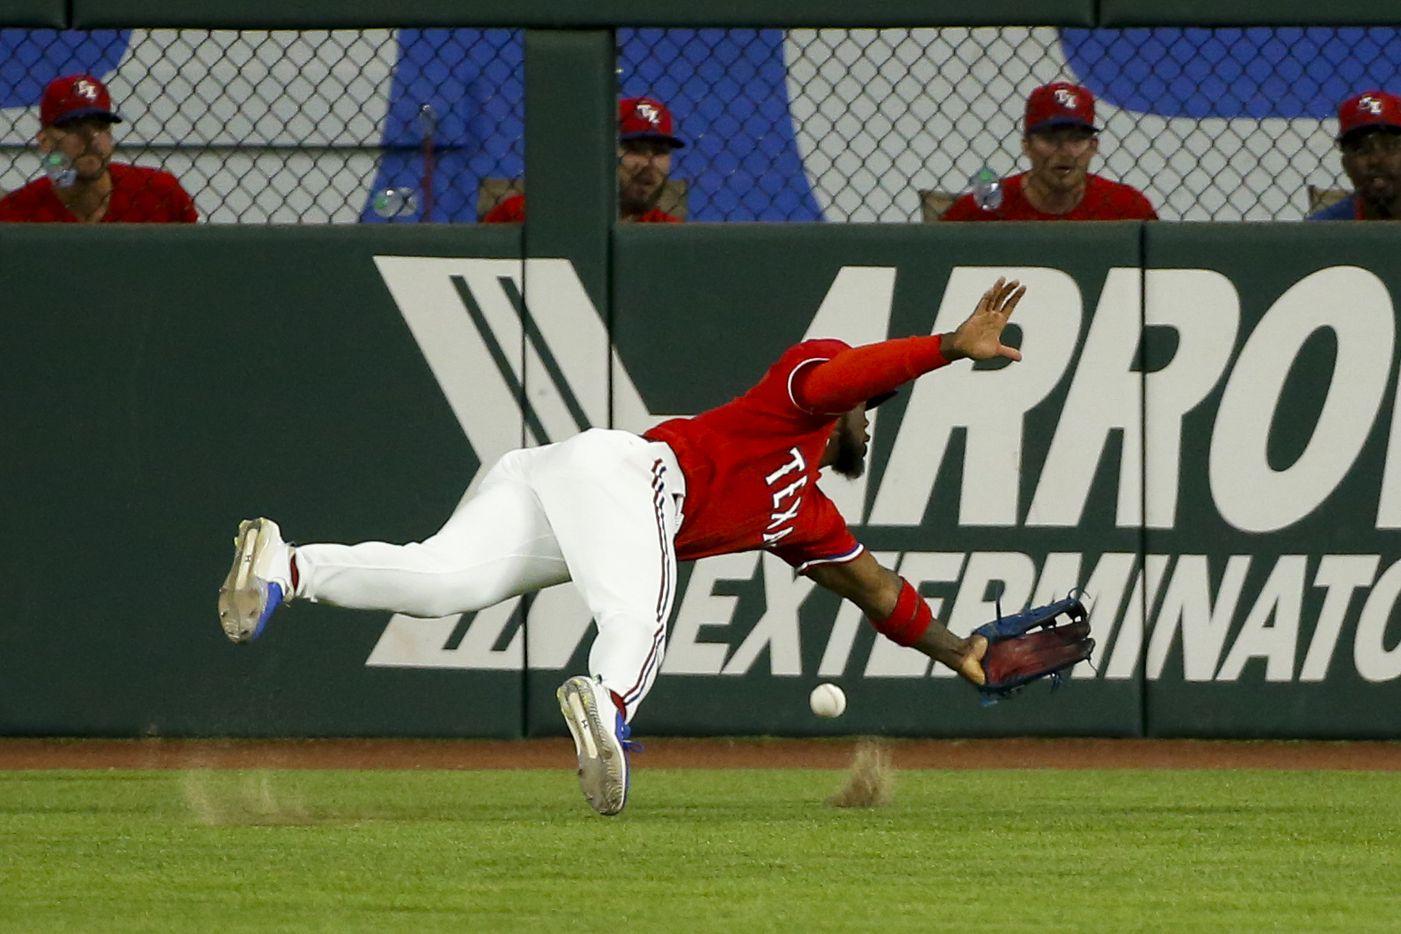 Texas Rangers center fielder Adolis Garcia (53) misplays the ball during the third inning against the Kansas City Royals at Globe Life Field on Friday, June 25, 2021, in Arlington. (Elias Valverde II/The Dallas Morning News)